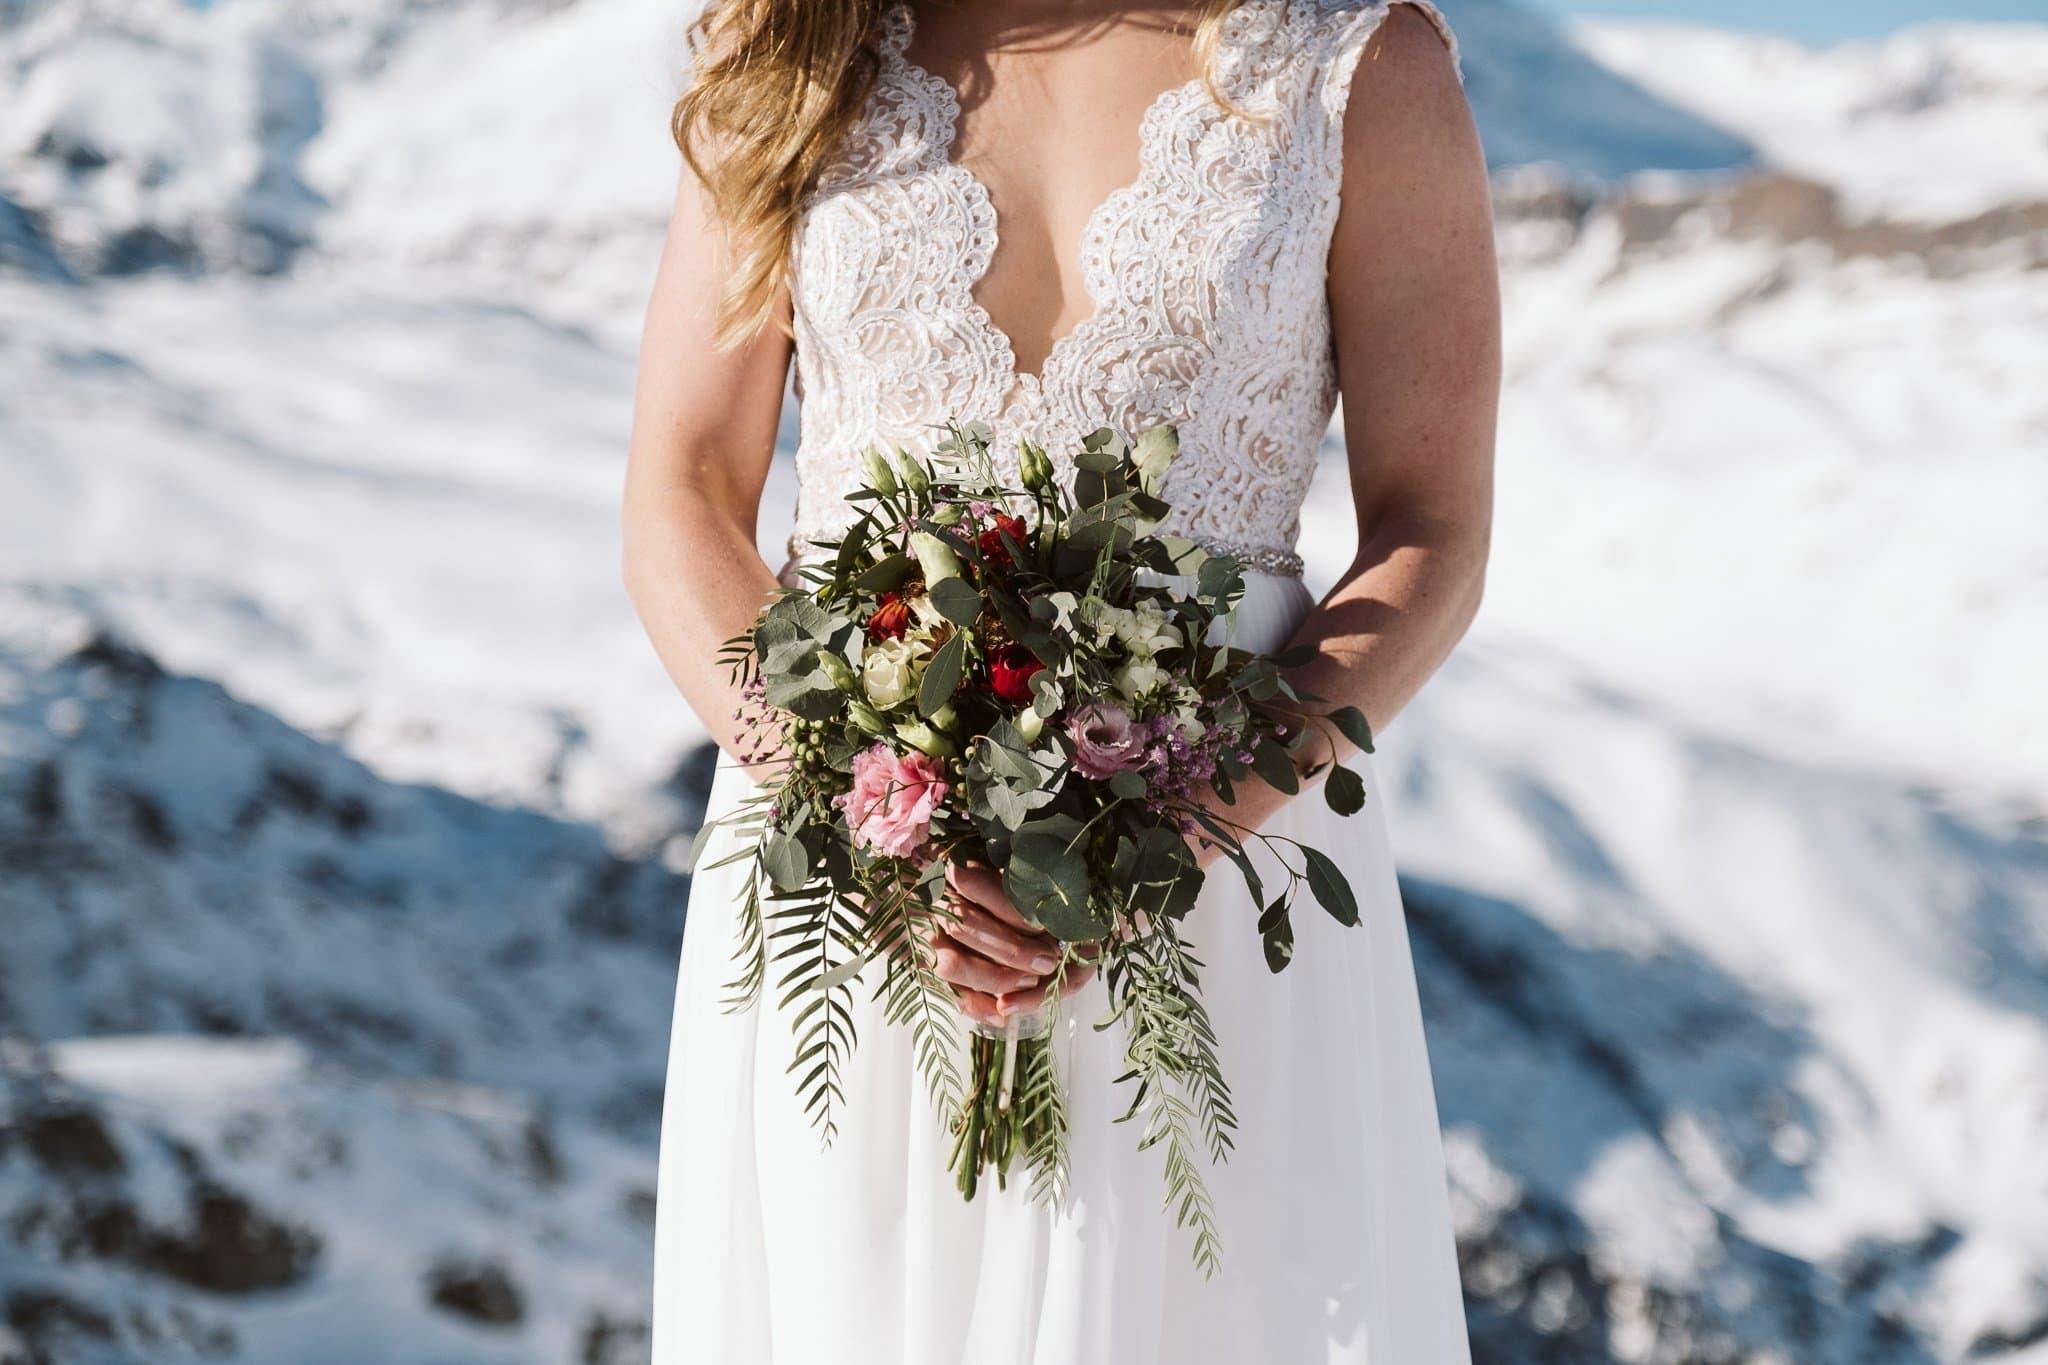 Bride portrait with wedding bouquet in front of Matterhorn in Zermatt, Switzerland wedding photographer.